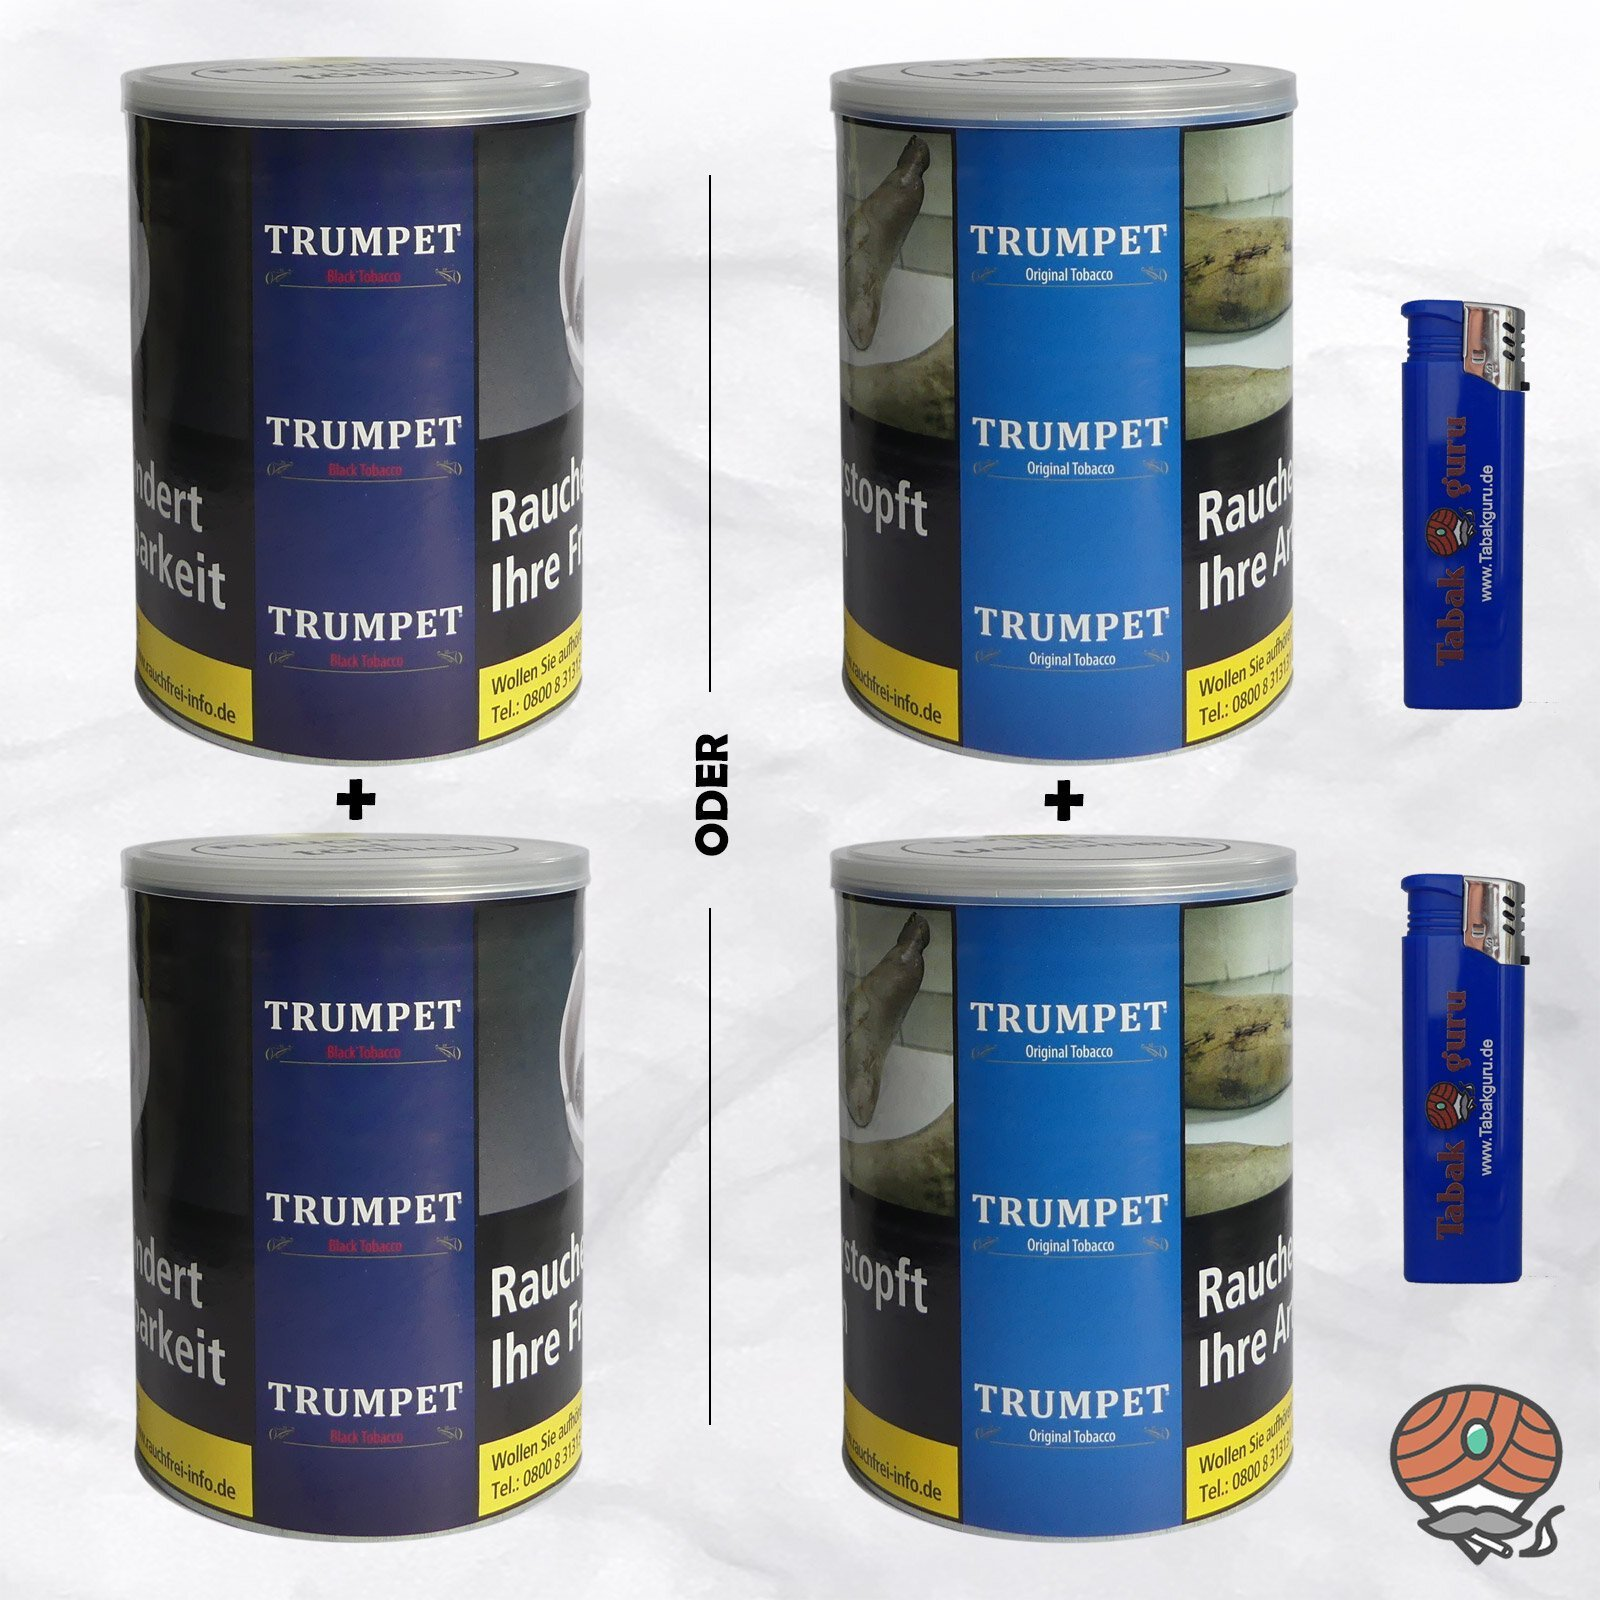 2 x Trumpet ORIGINAL oder BLACK Tobacco Drehtabak à 130 g Dose wählbar - 2 Dosen ORIGINAL